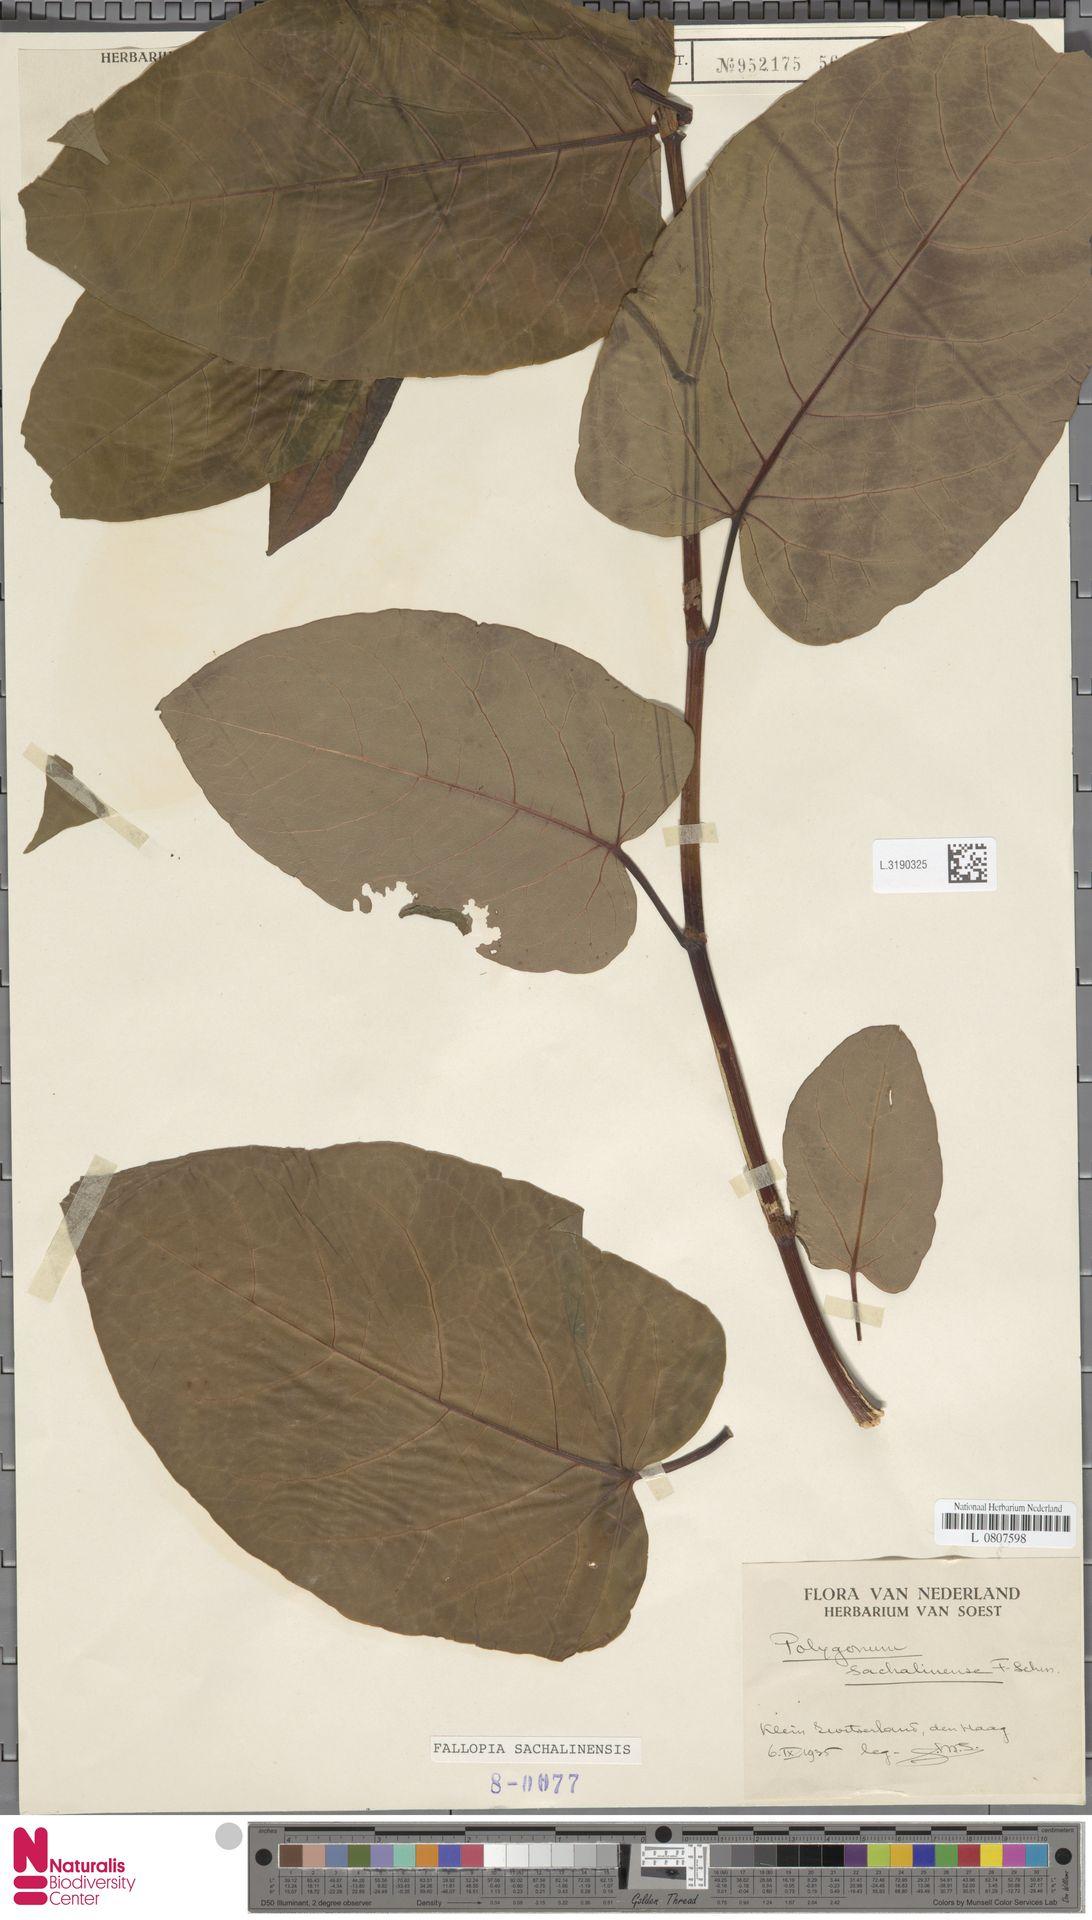 L.3190325 | Fallopia sachalinensis (F.Schmidt) Ronse Decr.